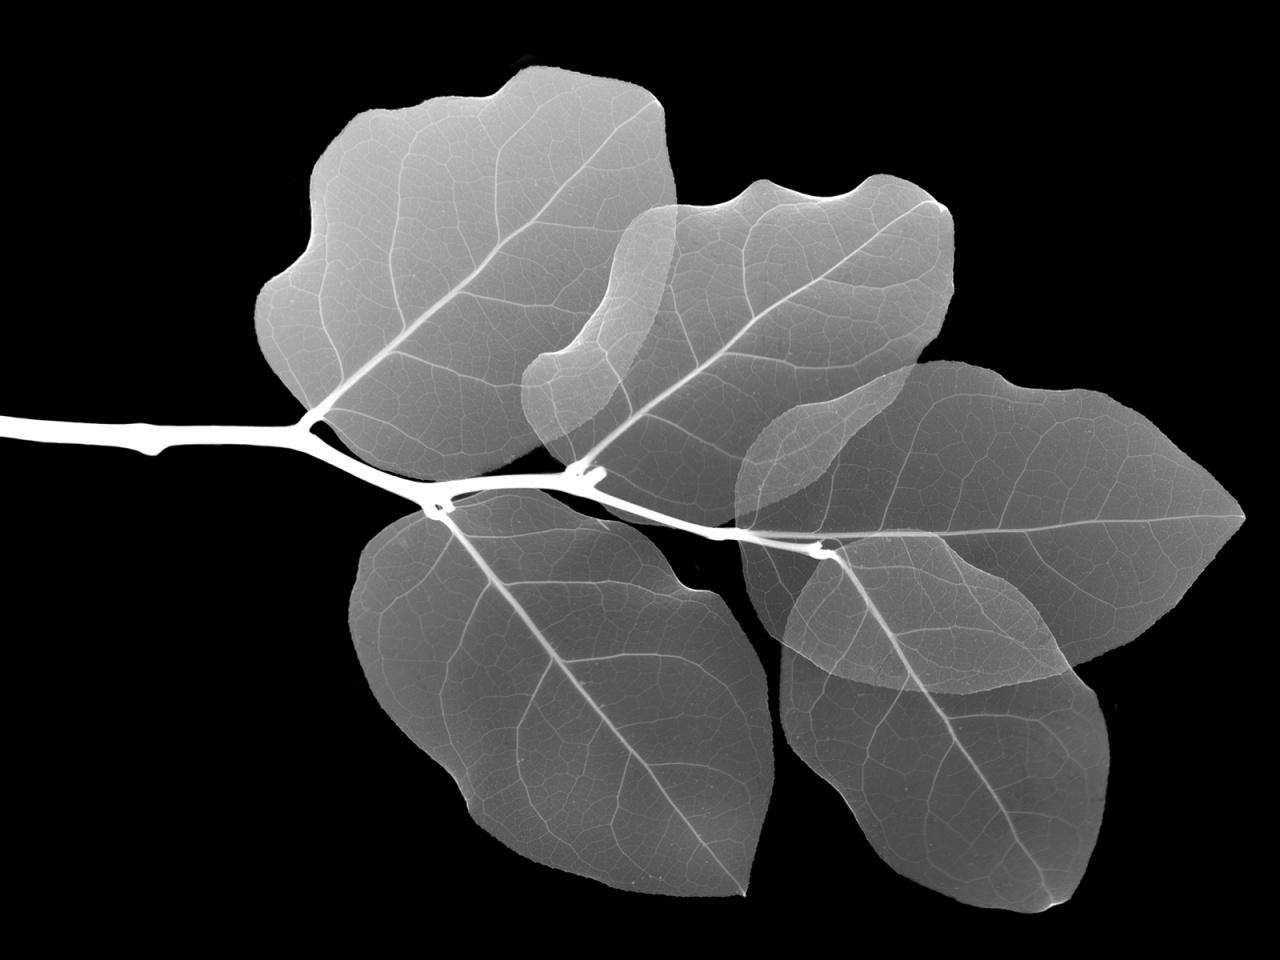 http://3.bp.blogspot.com/-5DUGme193RQ/UIPOX90silI/AAAAAAAAA9M/PZ9o1d-9hfg/s1600/Black-and-White-Leaf-Wallpaper.jpg